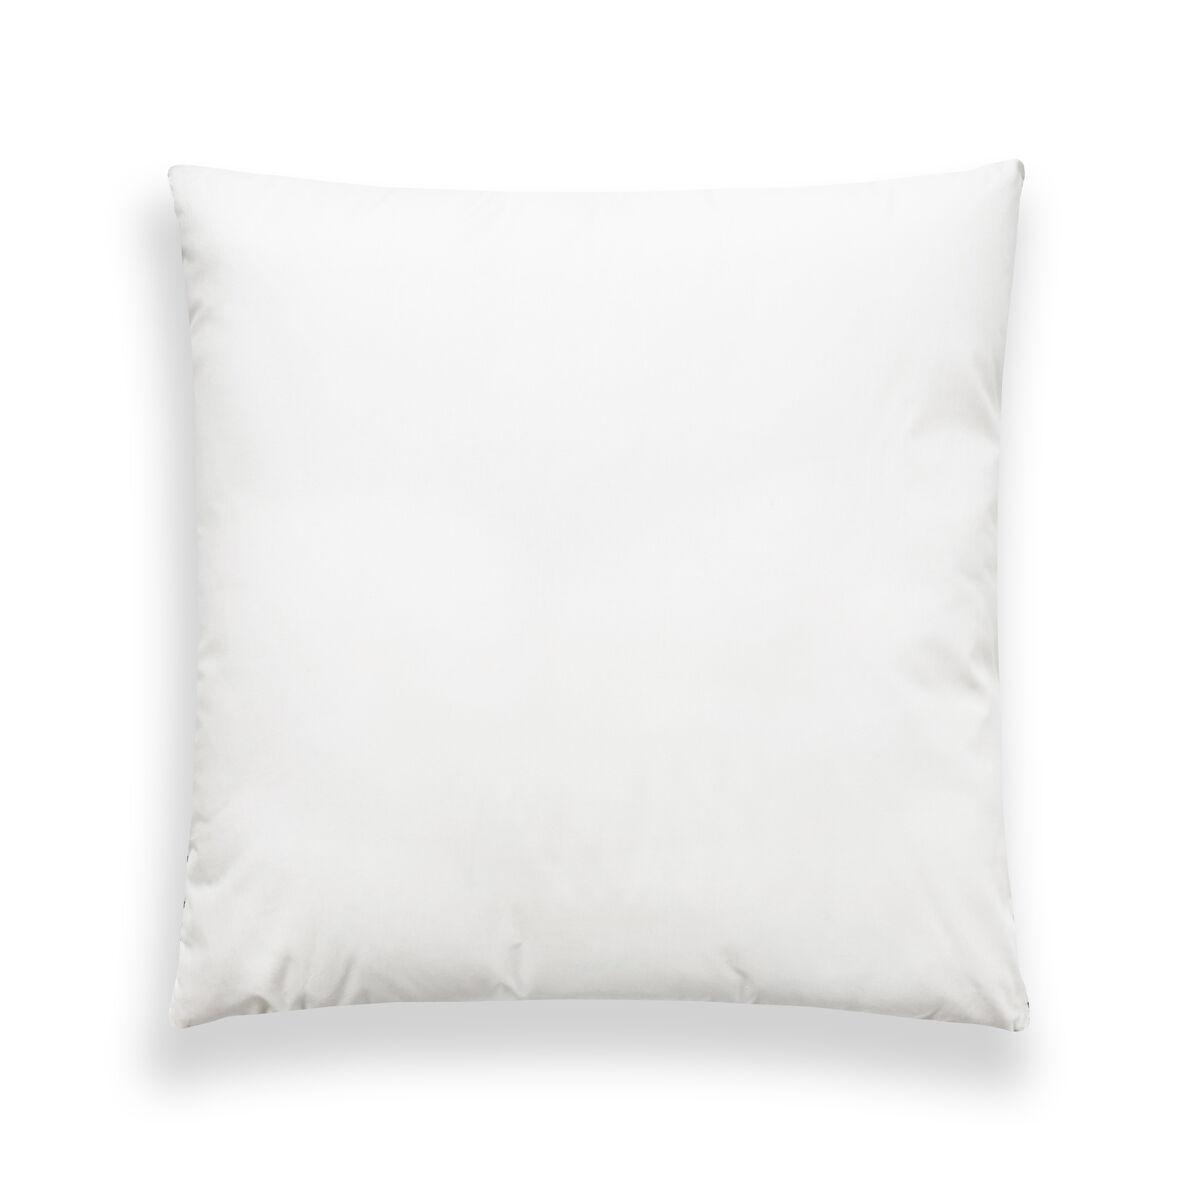 WAKE ME GREEN Oreiller FERME Extra-Doux - Coton Bio  50x70 cm